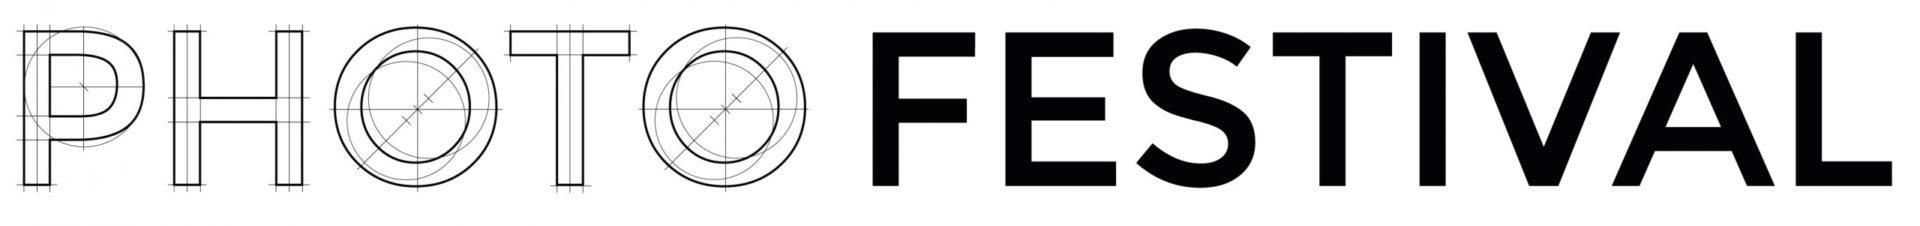 Logo PHOTOFESTIVAL scaled - Milano Photofestival